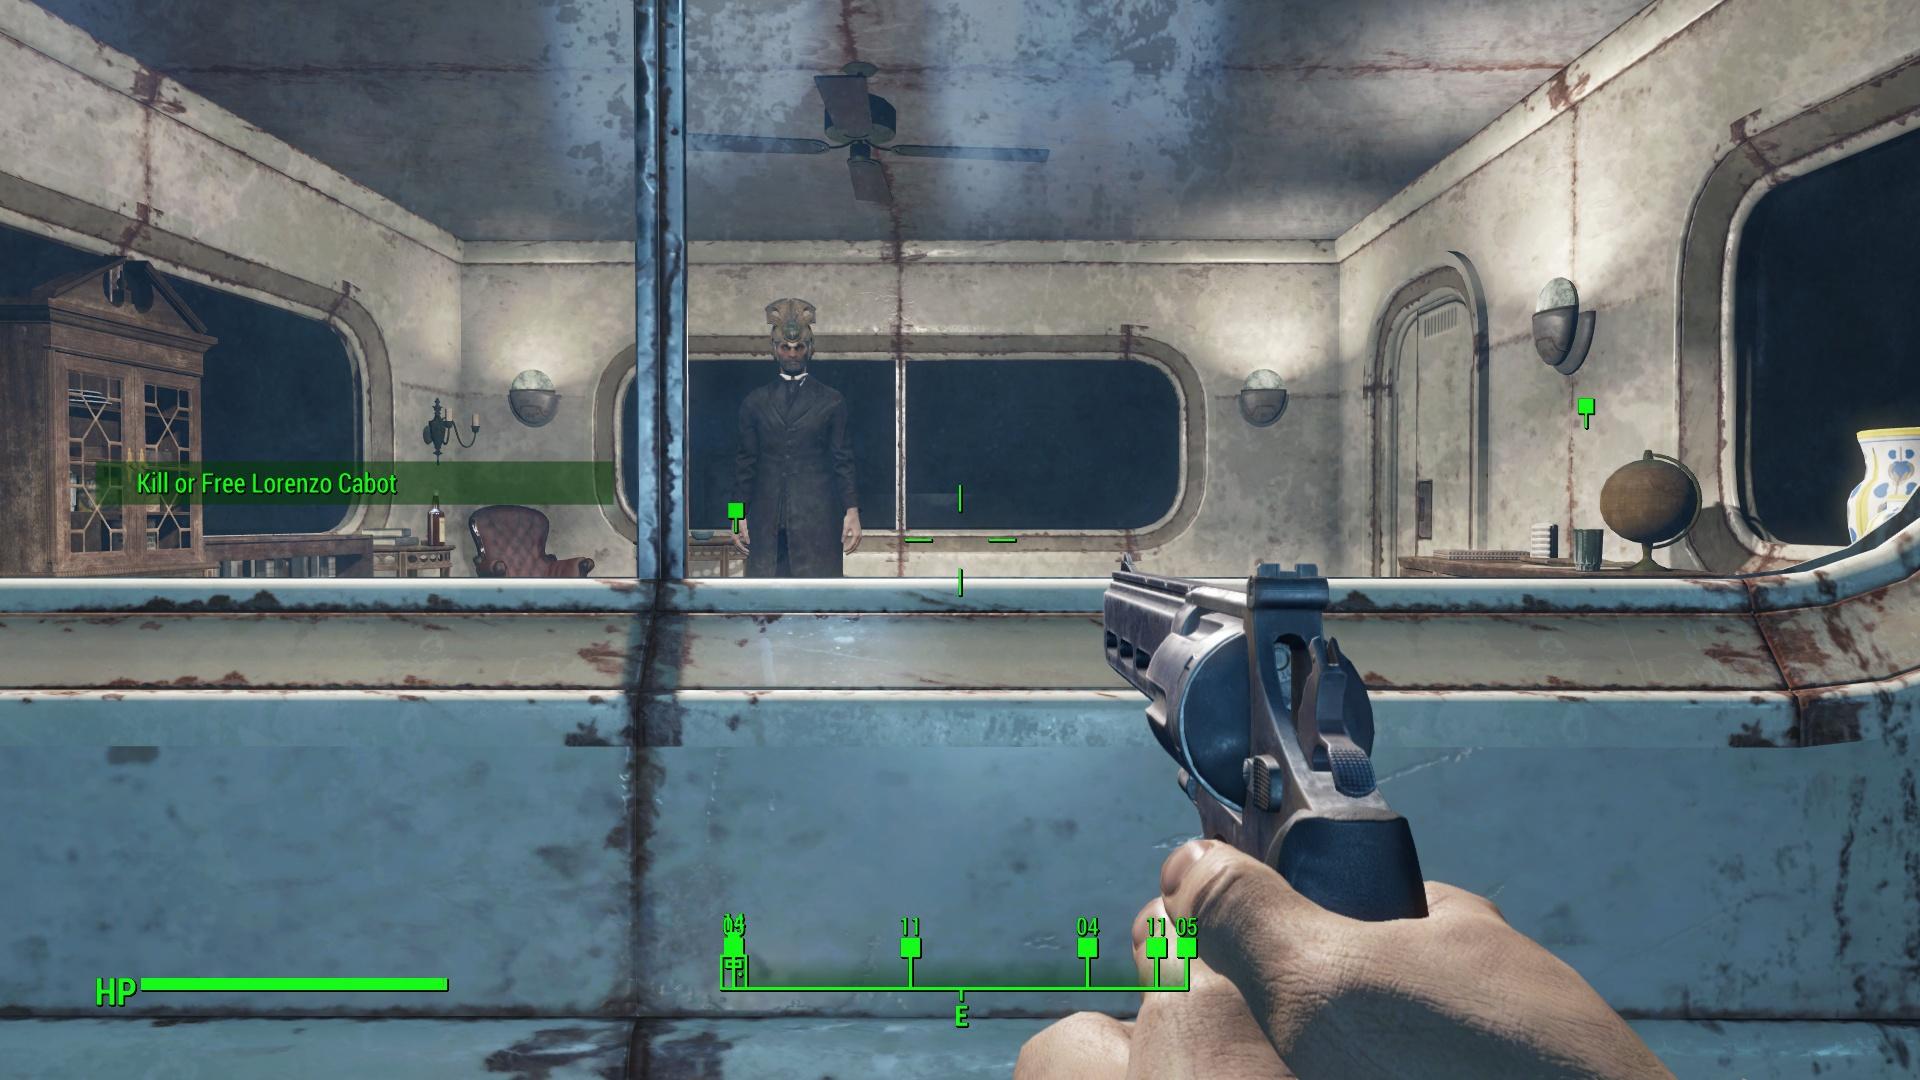 kill or free lorenzo fallout 4